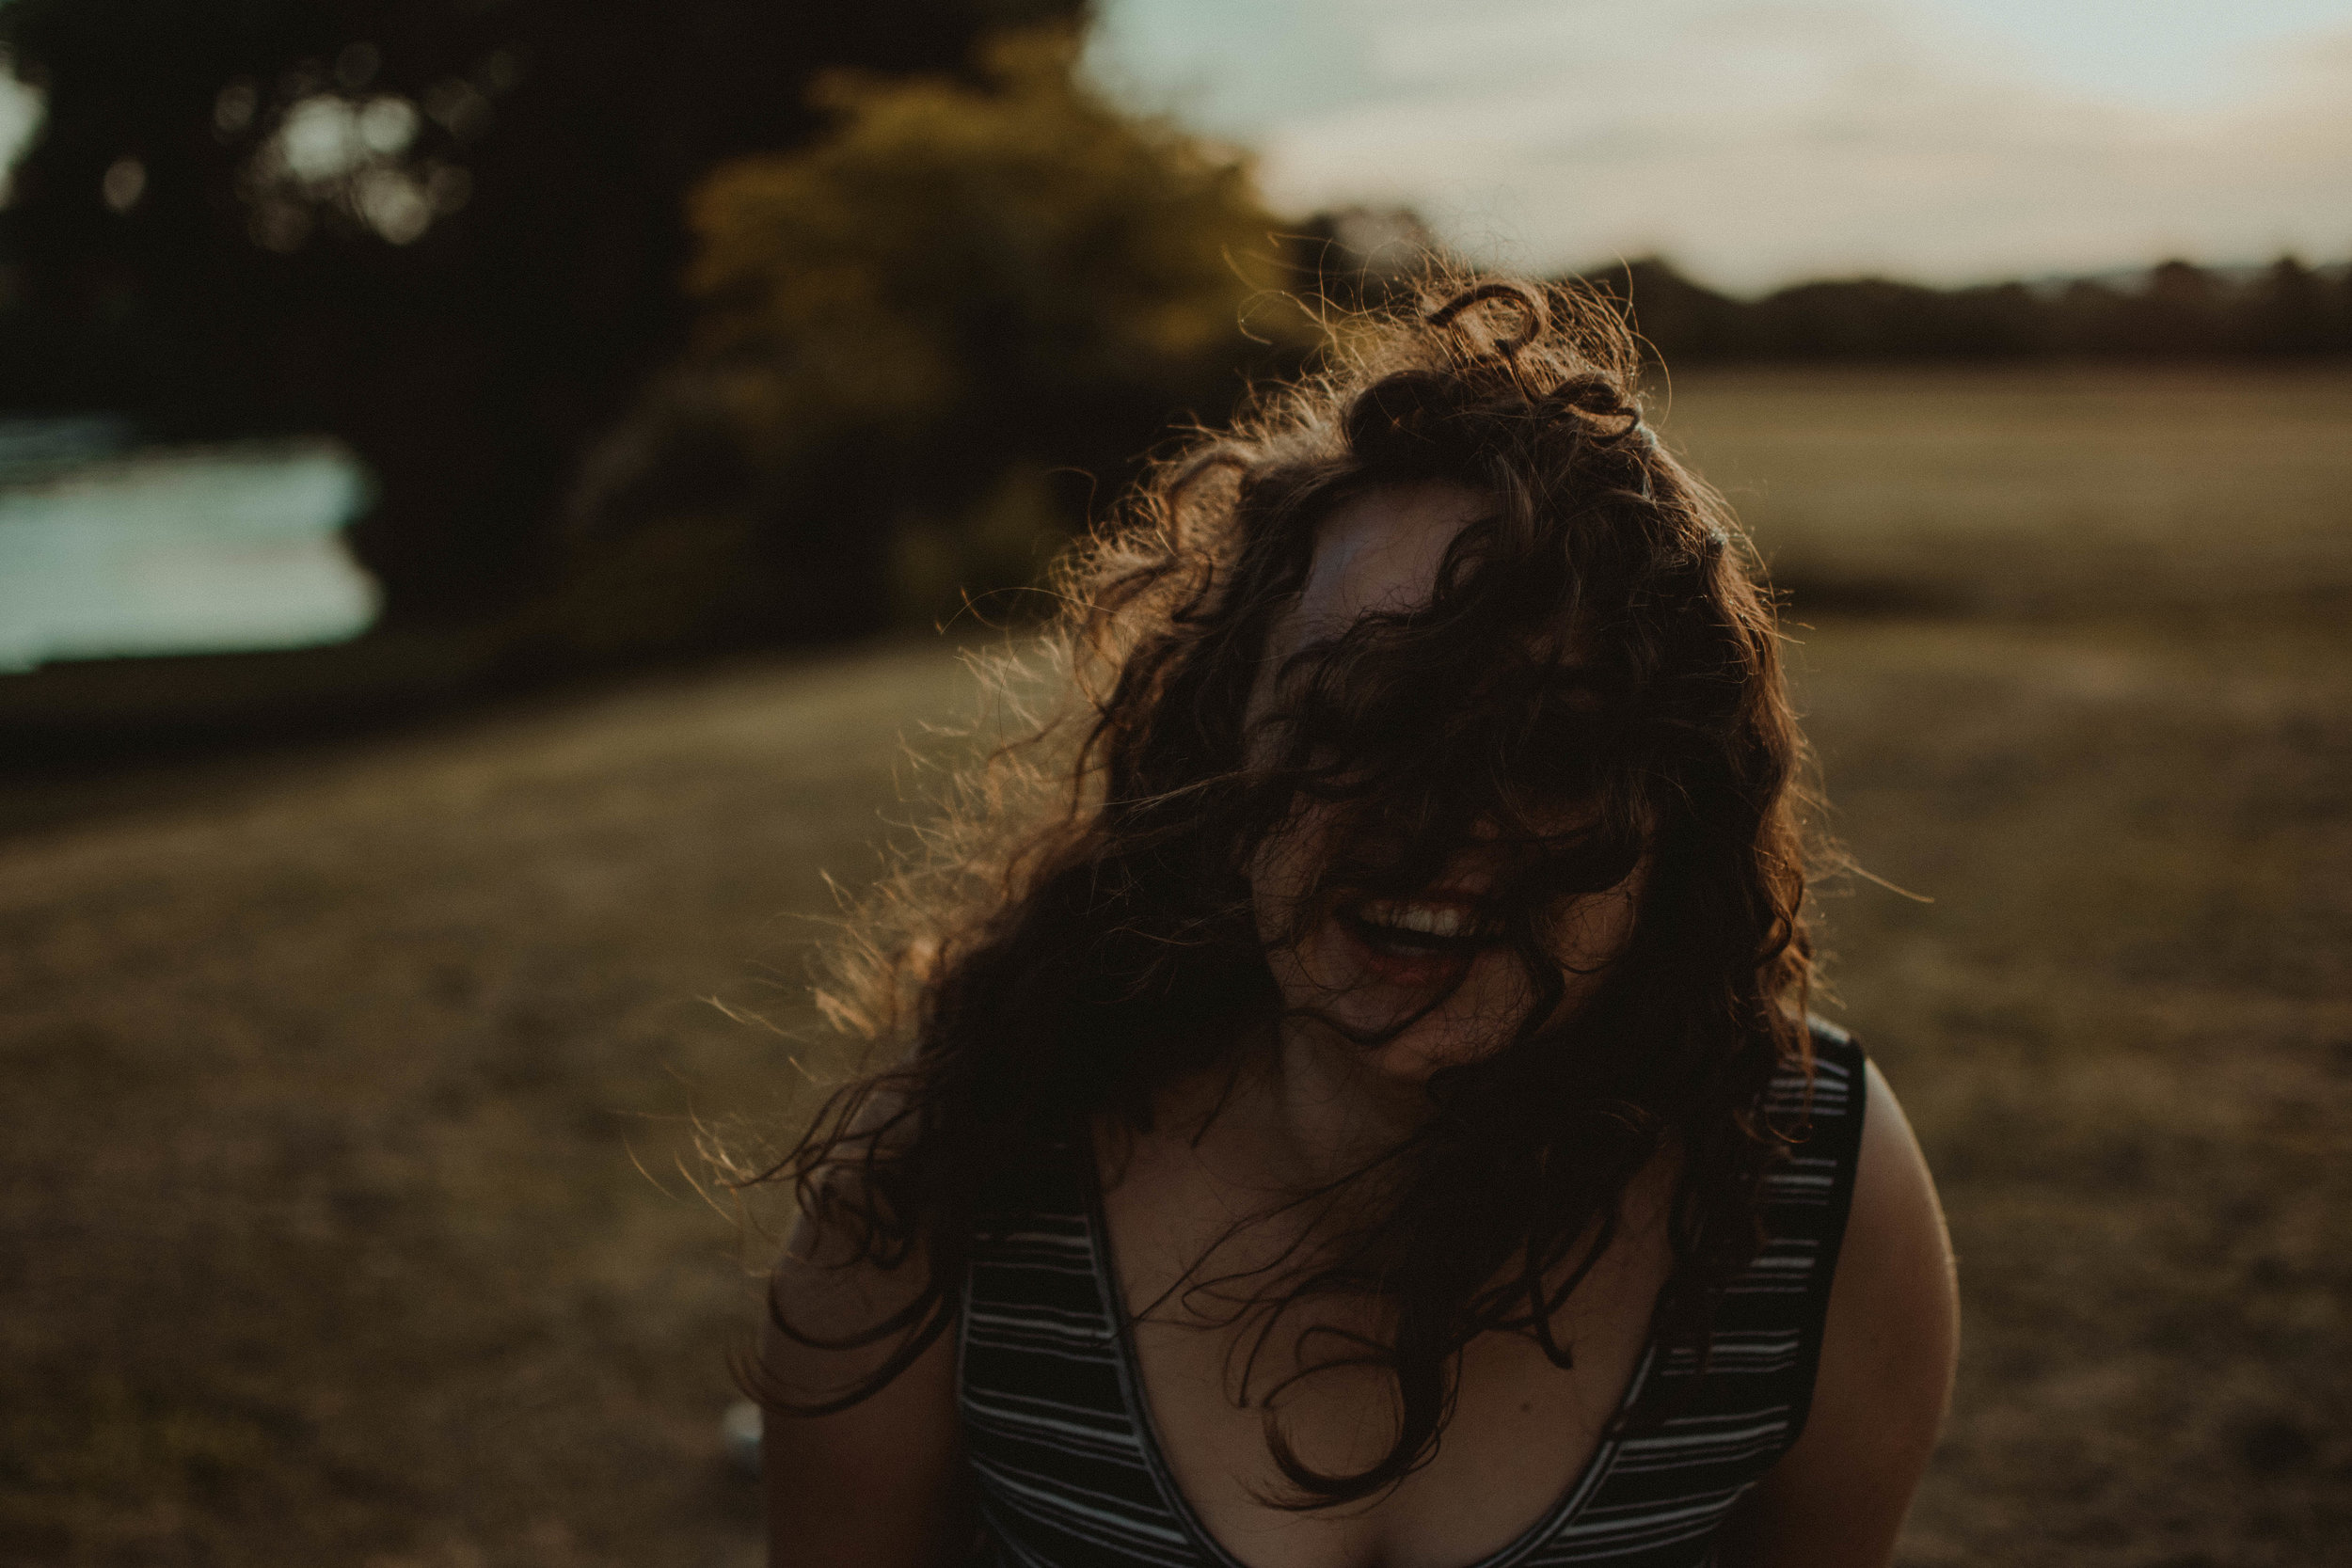 MEET YOUR FAVORITE THIRD WHEEL - WEDDING AND ELOPEMENT PHOTOGRAPHER BASED IN NORTHERN ARIZONA